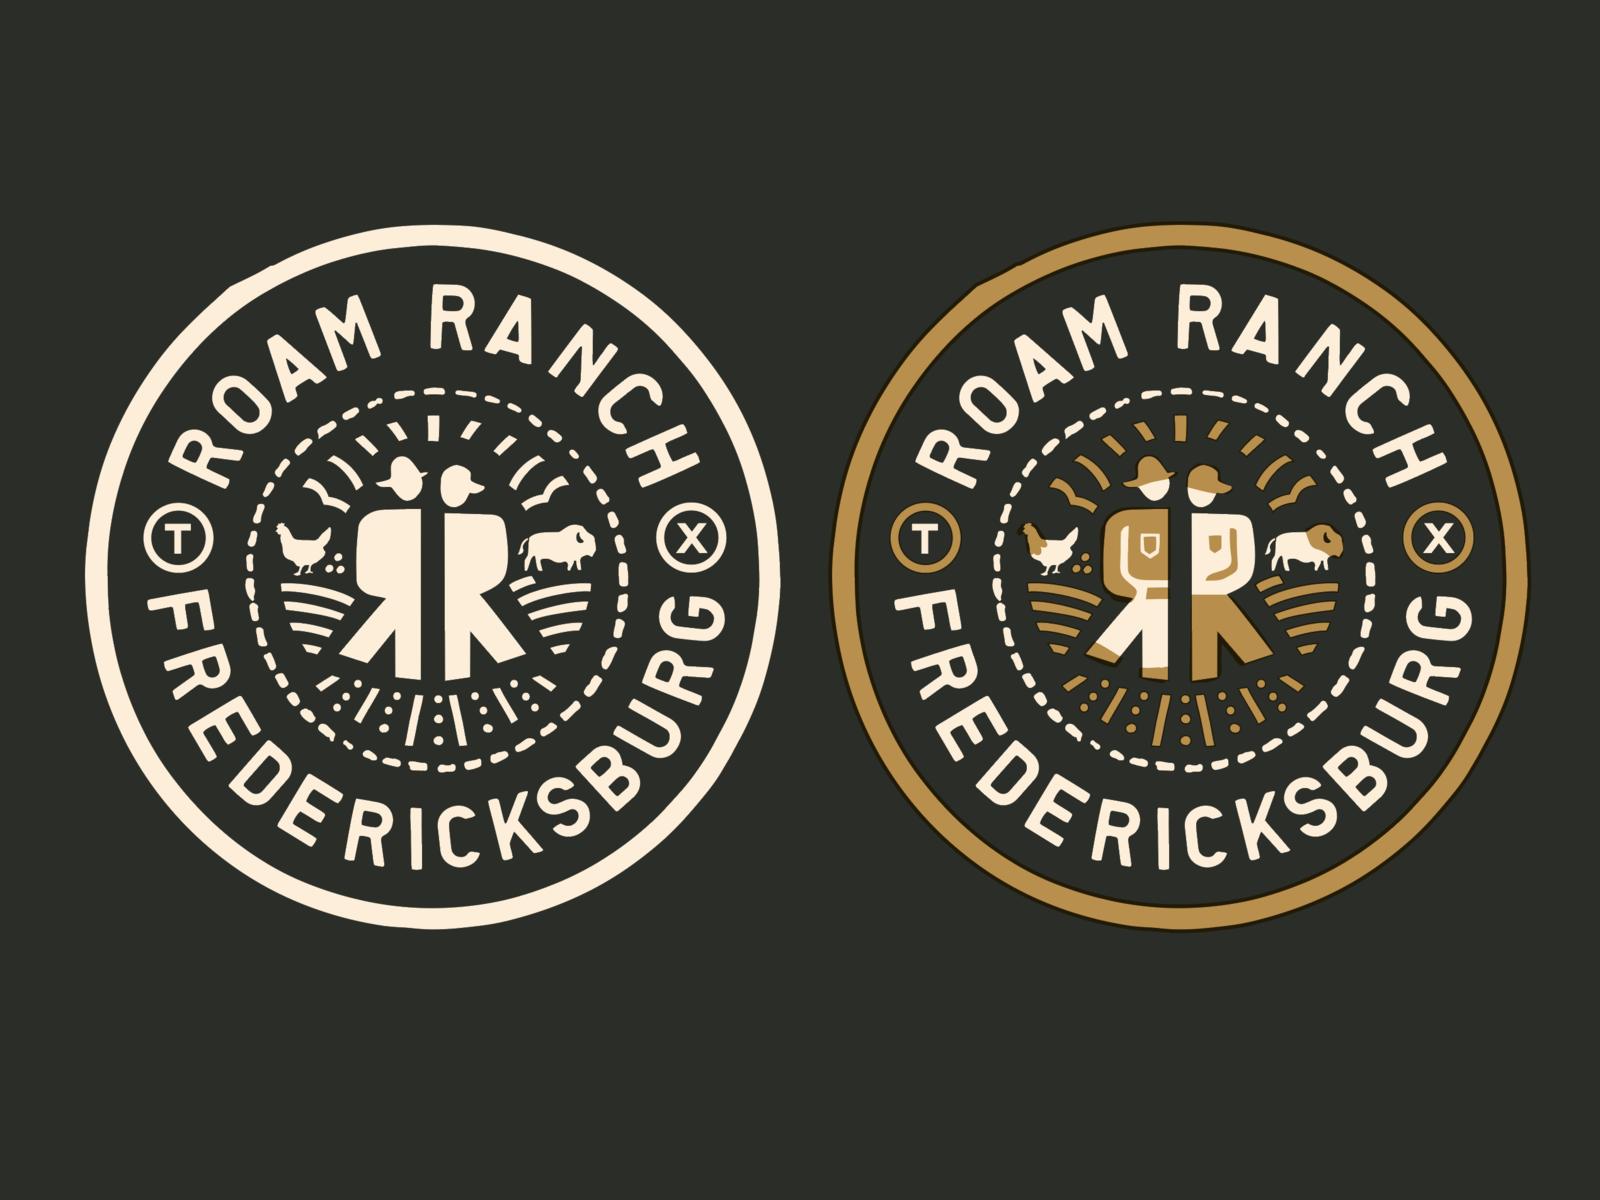 Roam ranch badge 4x